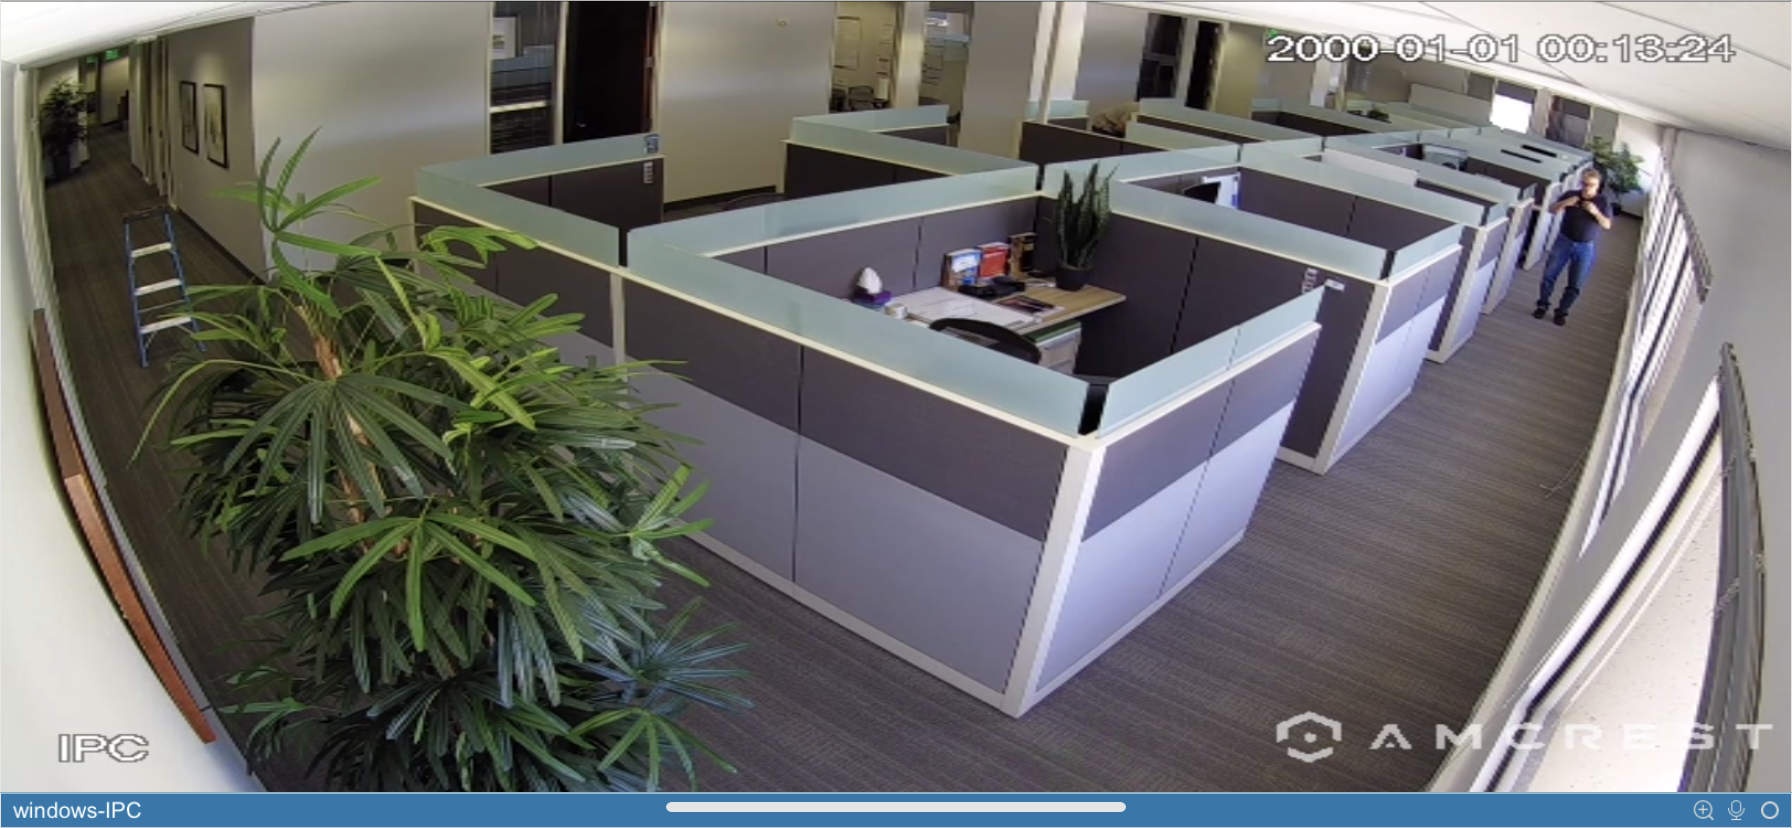 smart office technology powered by VANTIQ